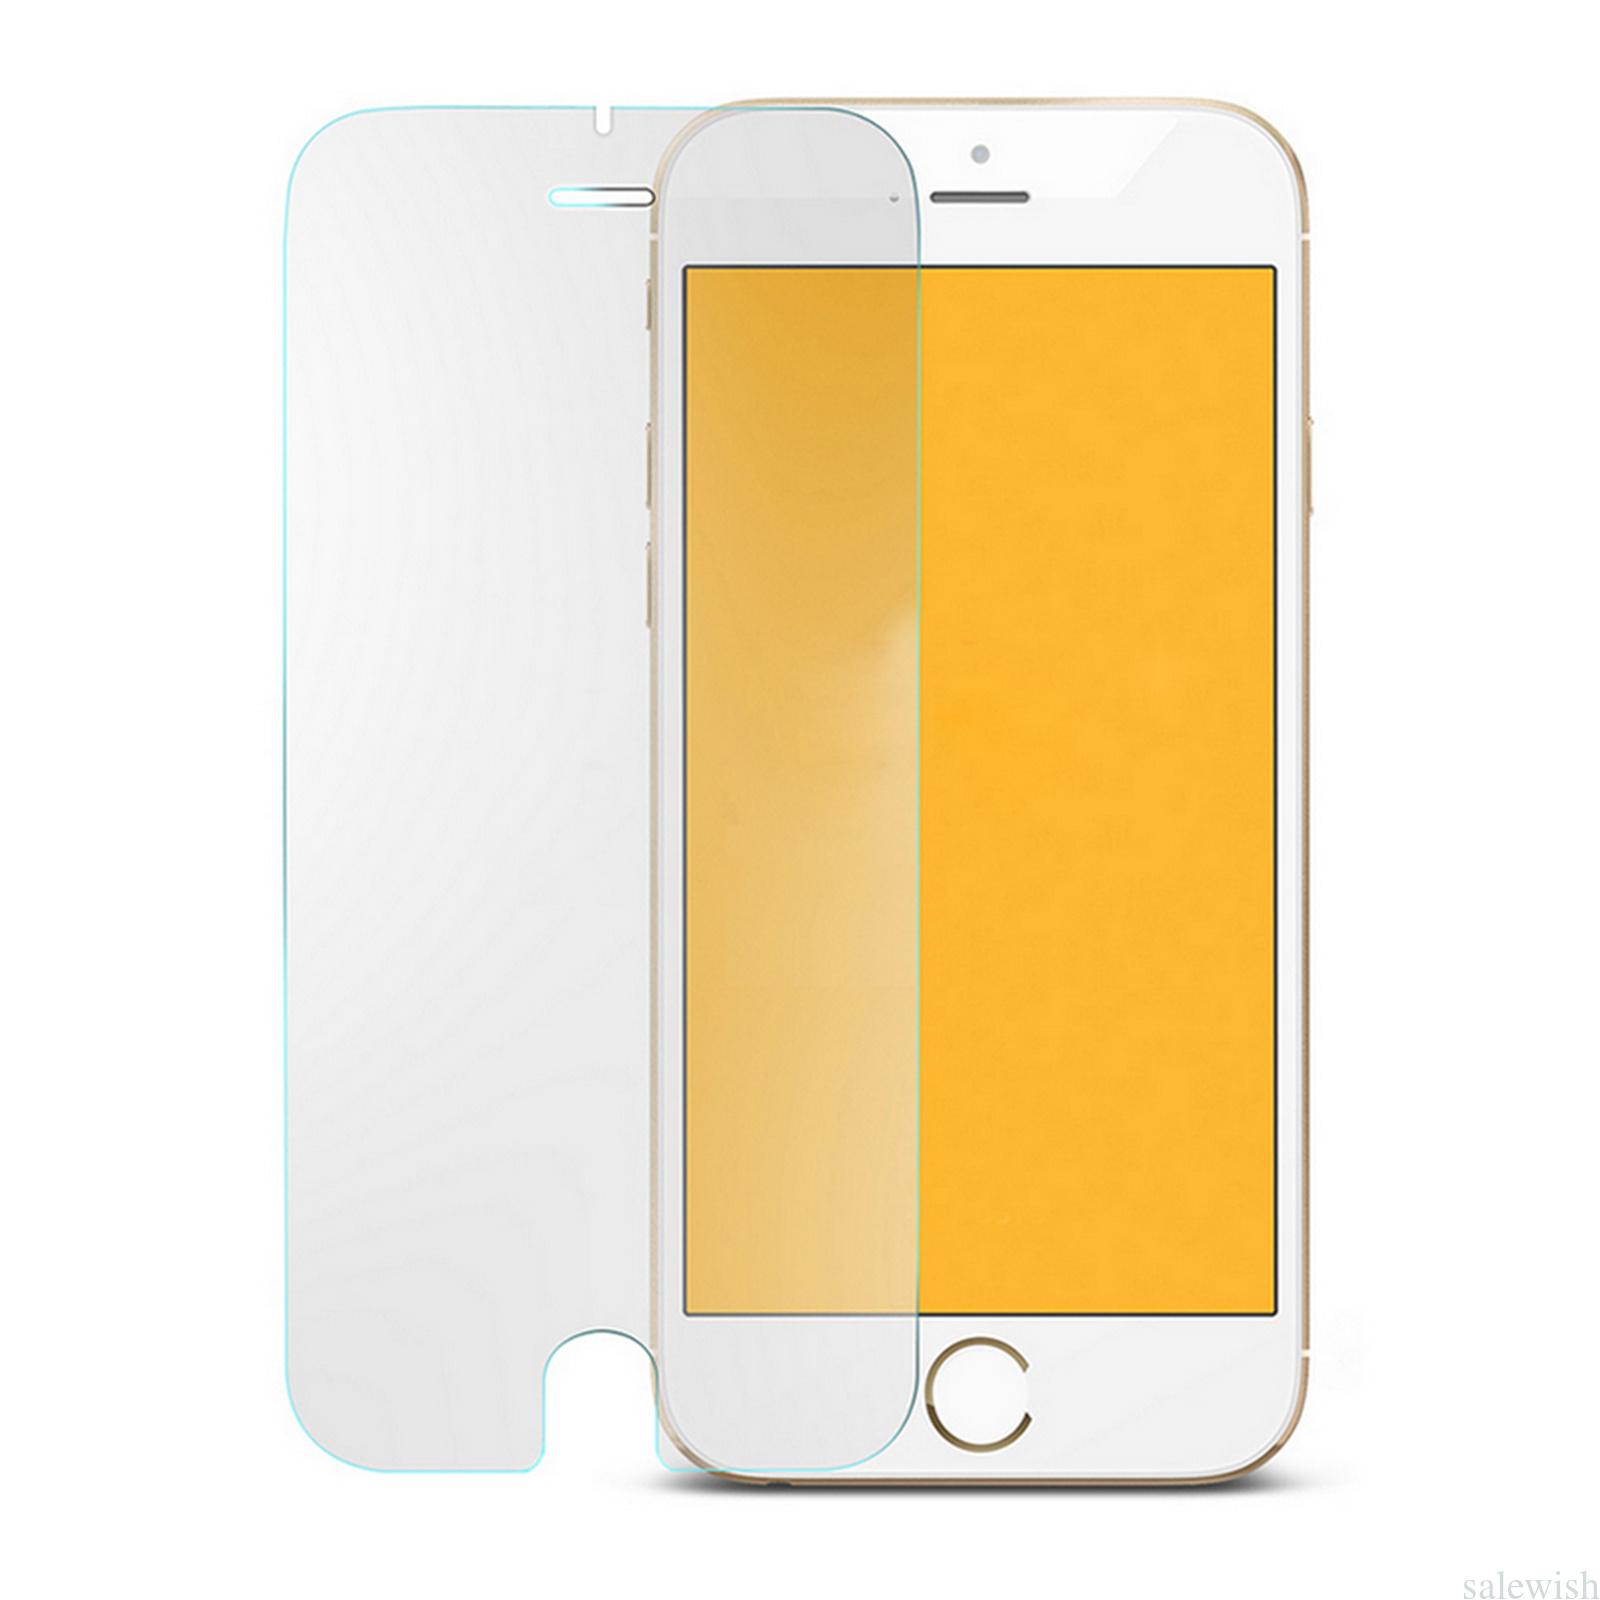 Protector-Cristal-Templado-Silk-para-iPhone-6-6S-7-Plus-9H-Transparente-New miniatura 10